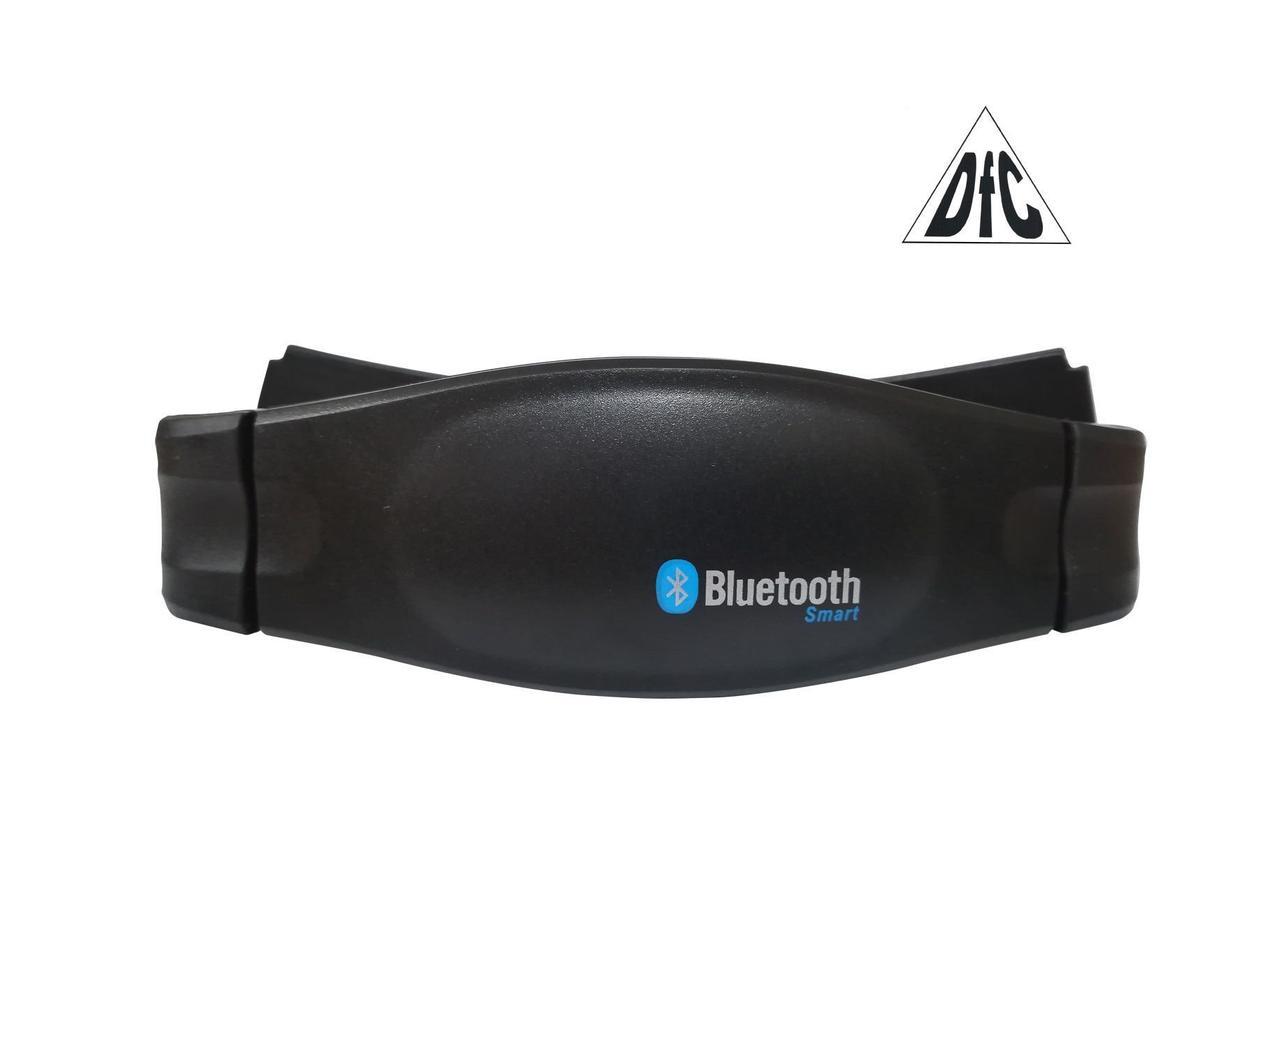 Нагрудный кардиопояс DFC W227Q (5кГц + Bluetooth) - фото 1